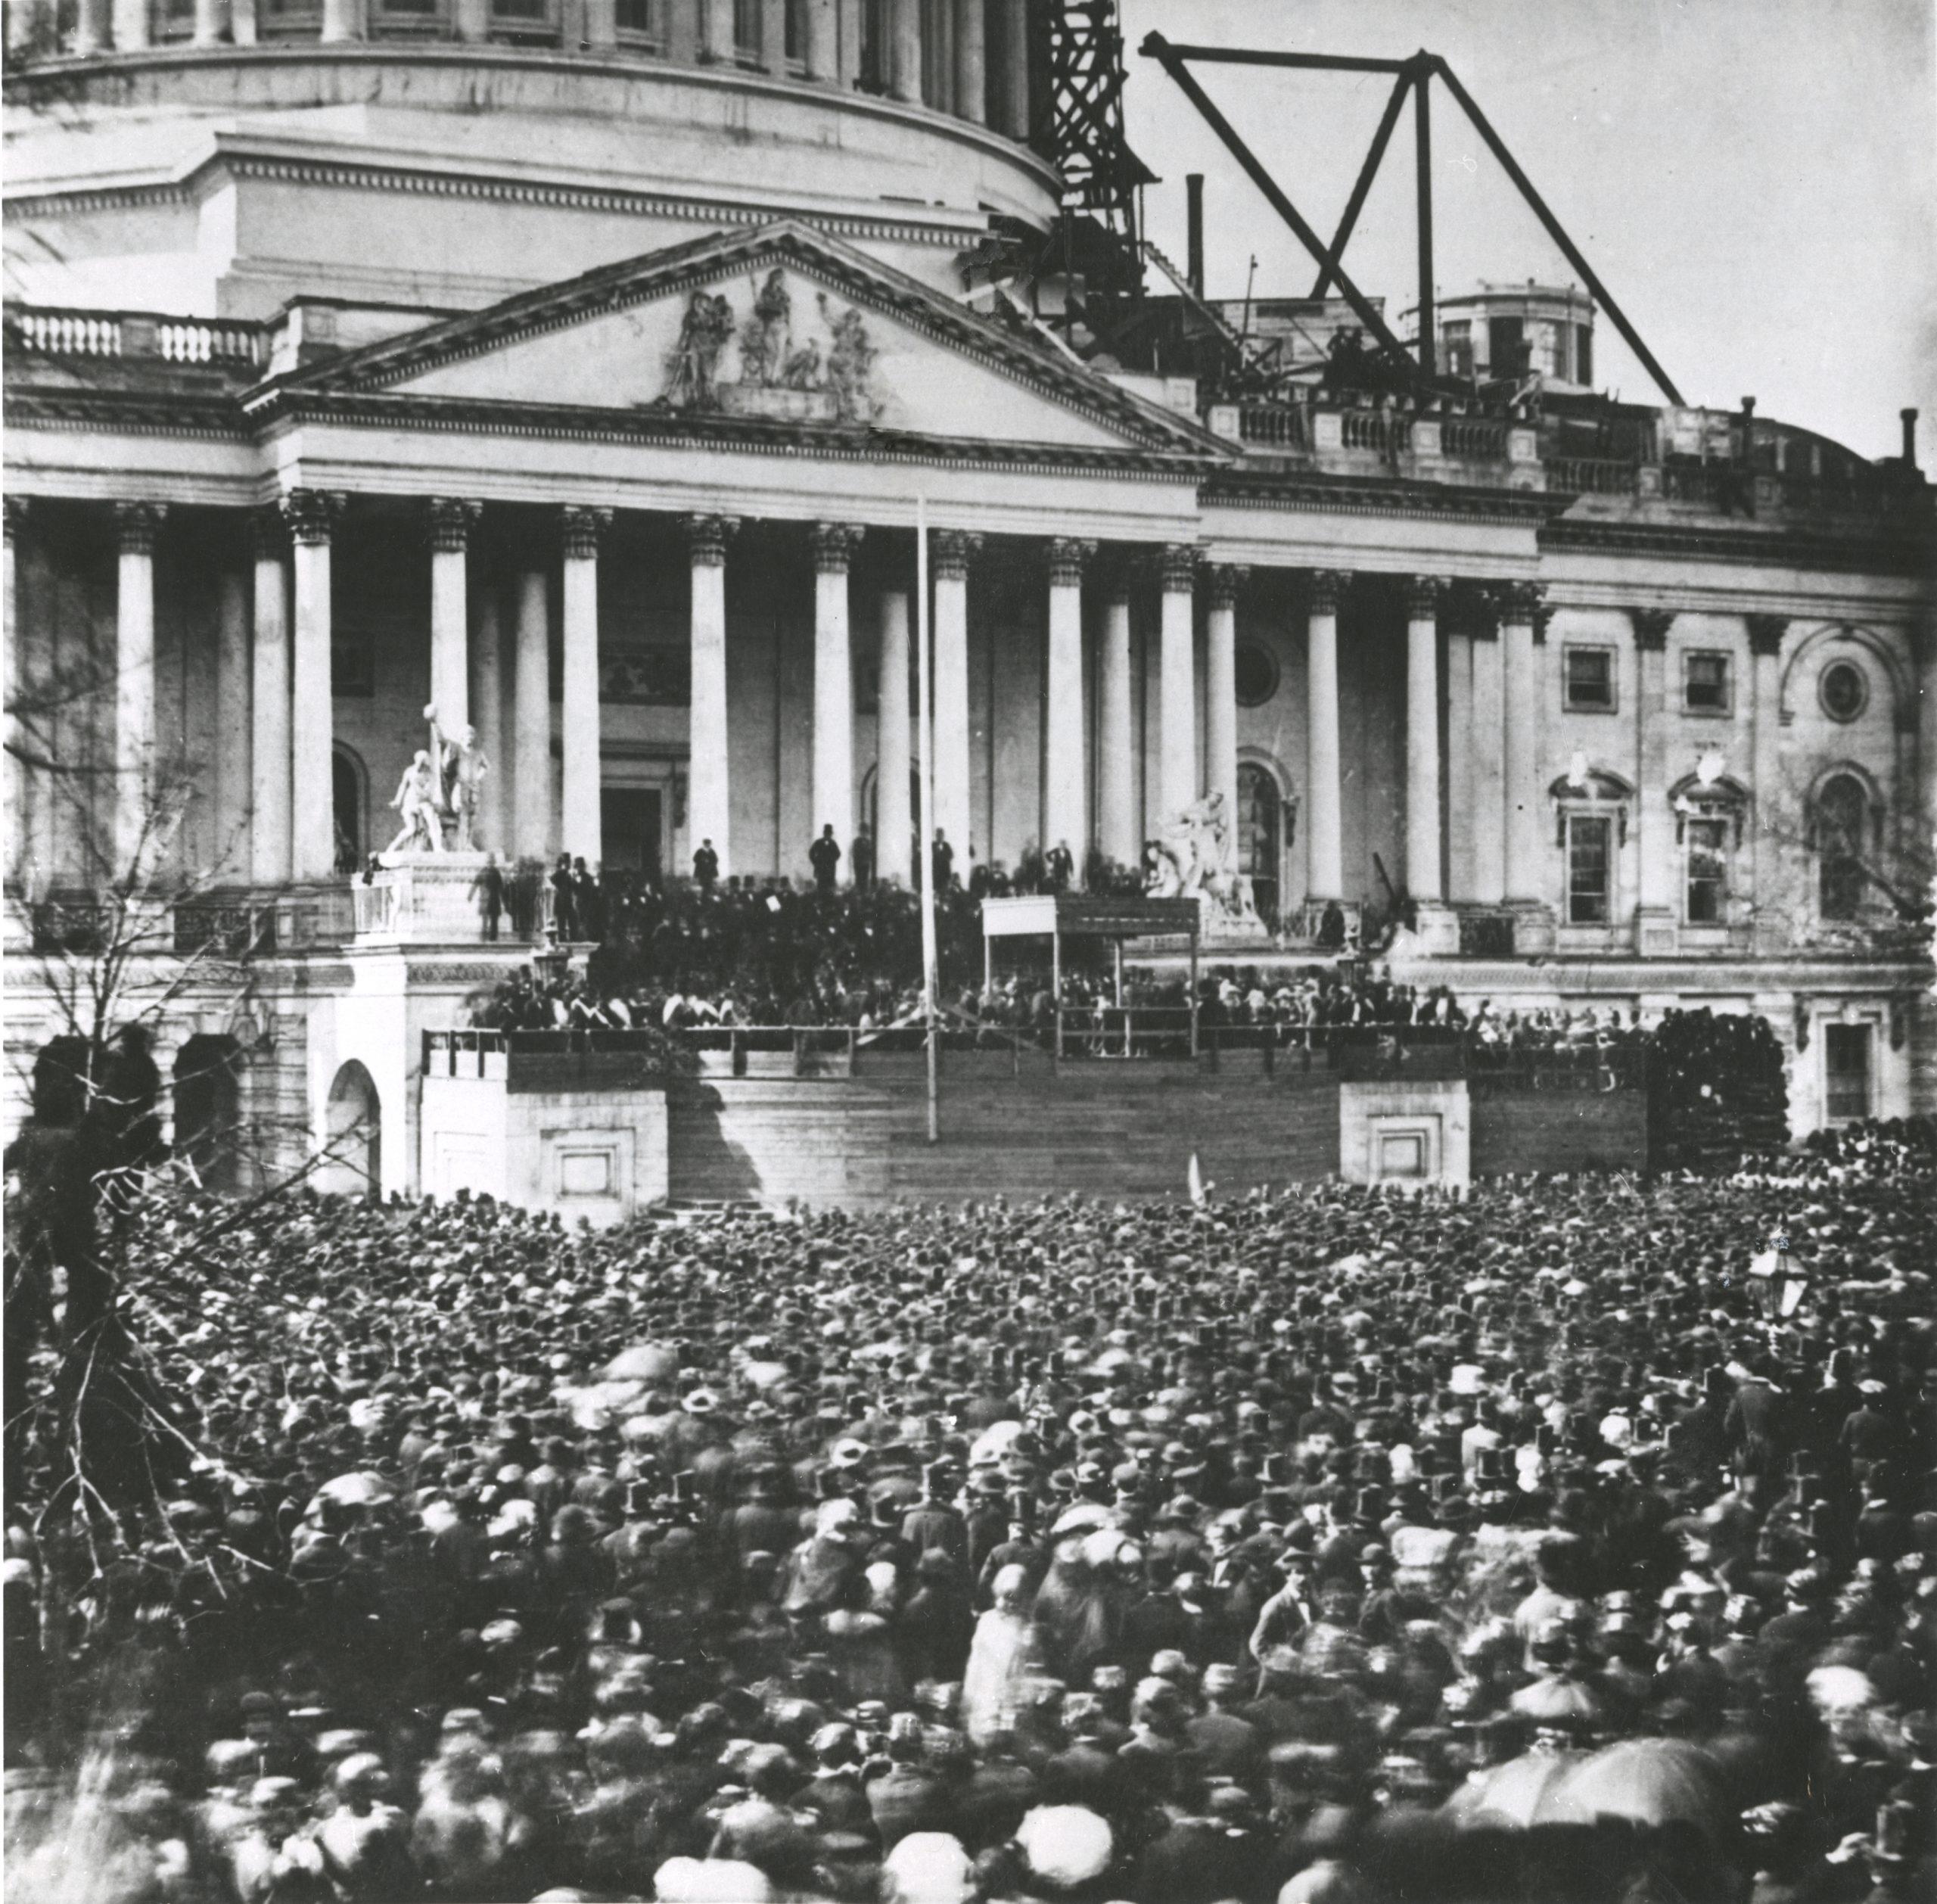 Abraham Lincoln elected President of the United States of America. Washington, 4th March 1861. (Photo by Mondadori Portfolio via Getty Images)